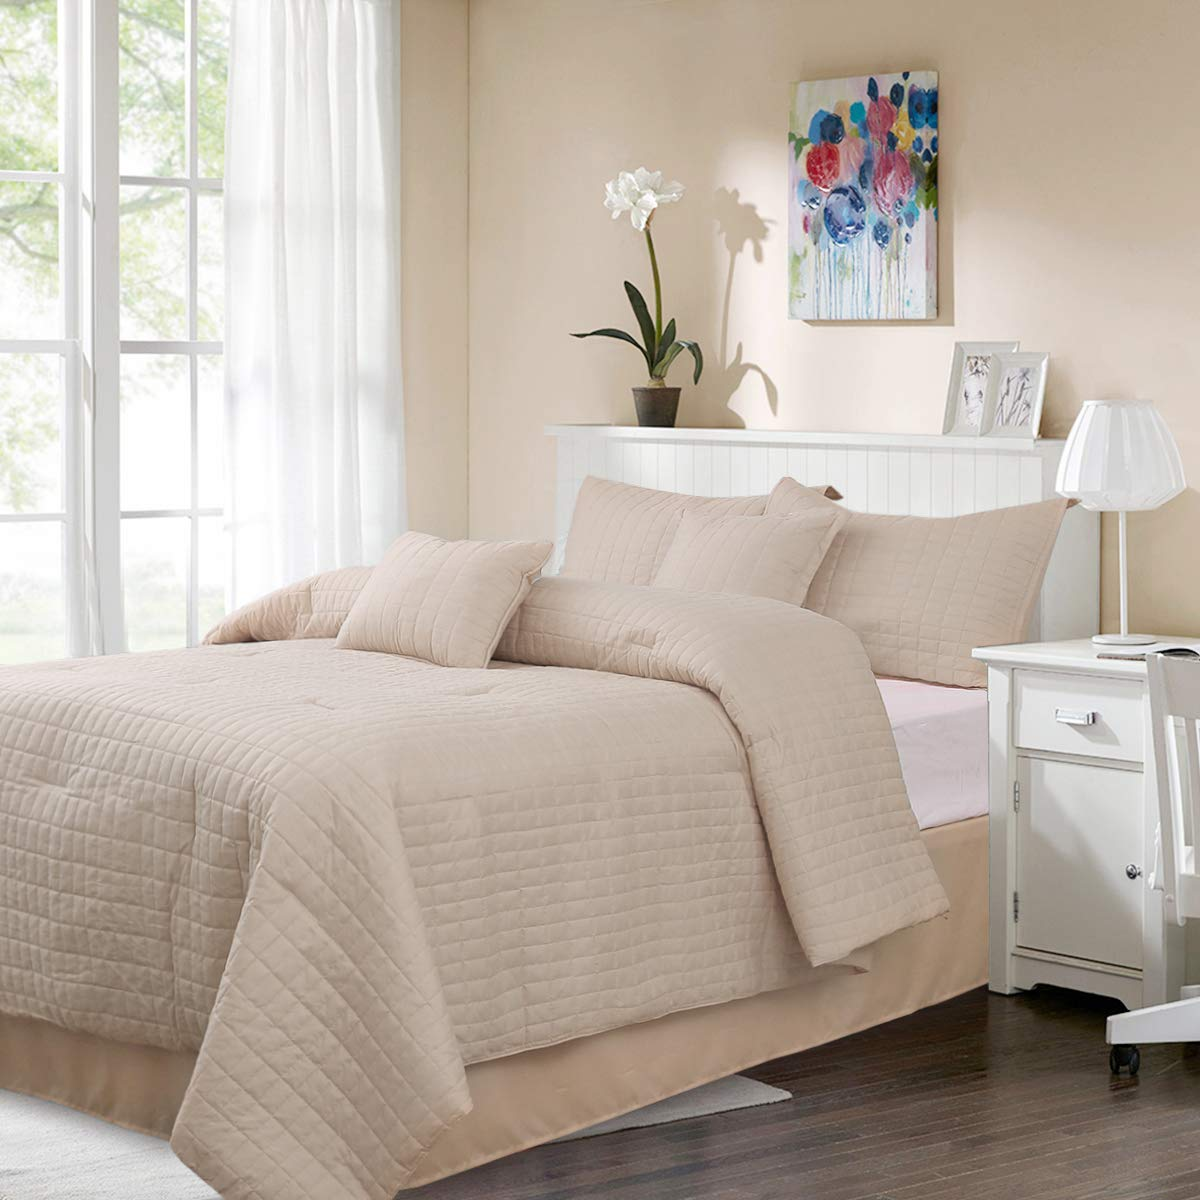 HONEYMOON HOME FASHIONS King Comforter Set 6 Piece, 1 x Comforter, 1 x Bedskirt, 2 x Shams and 2 x Decorative Pillows, Gray